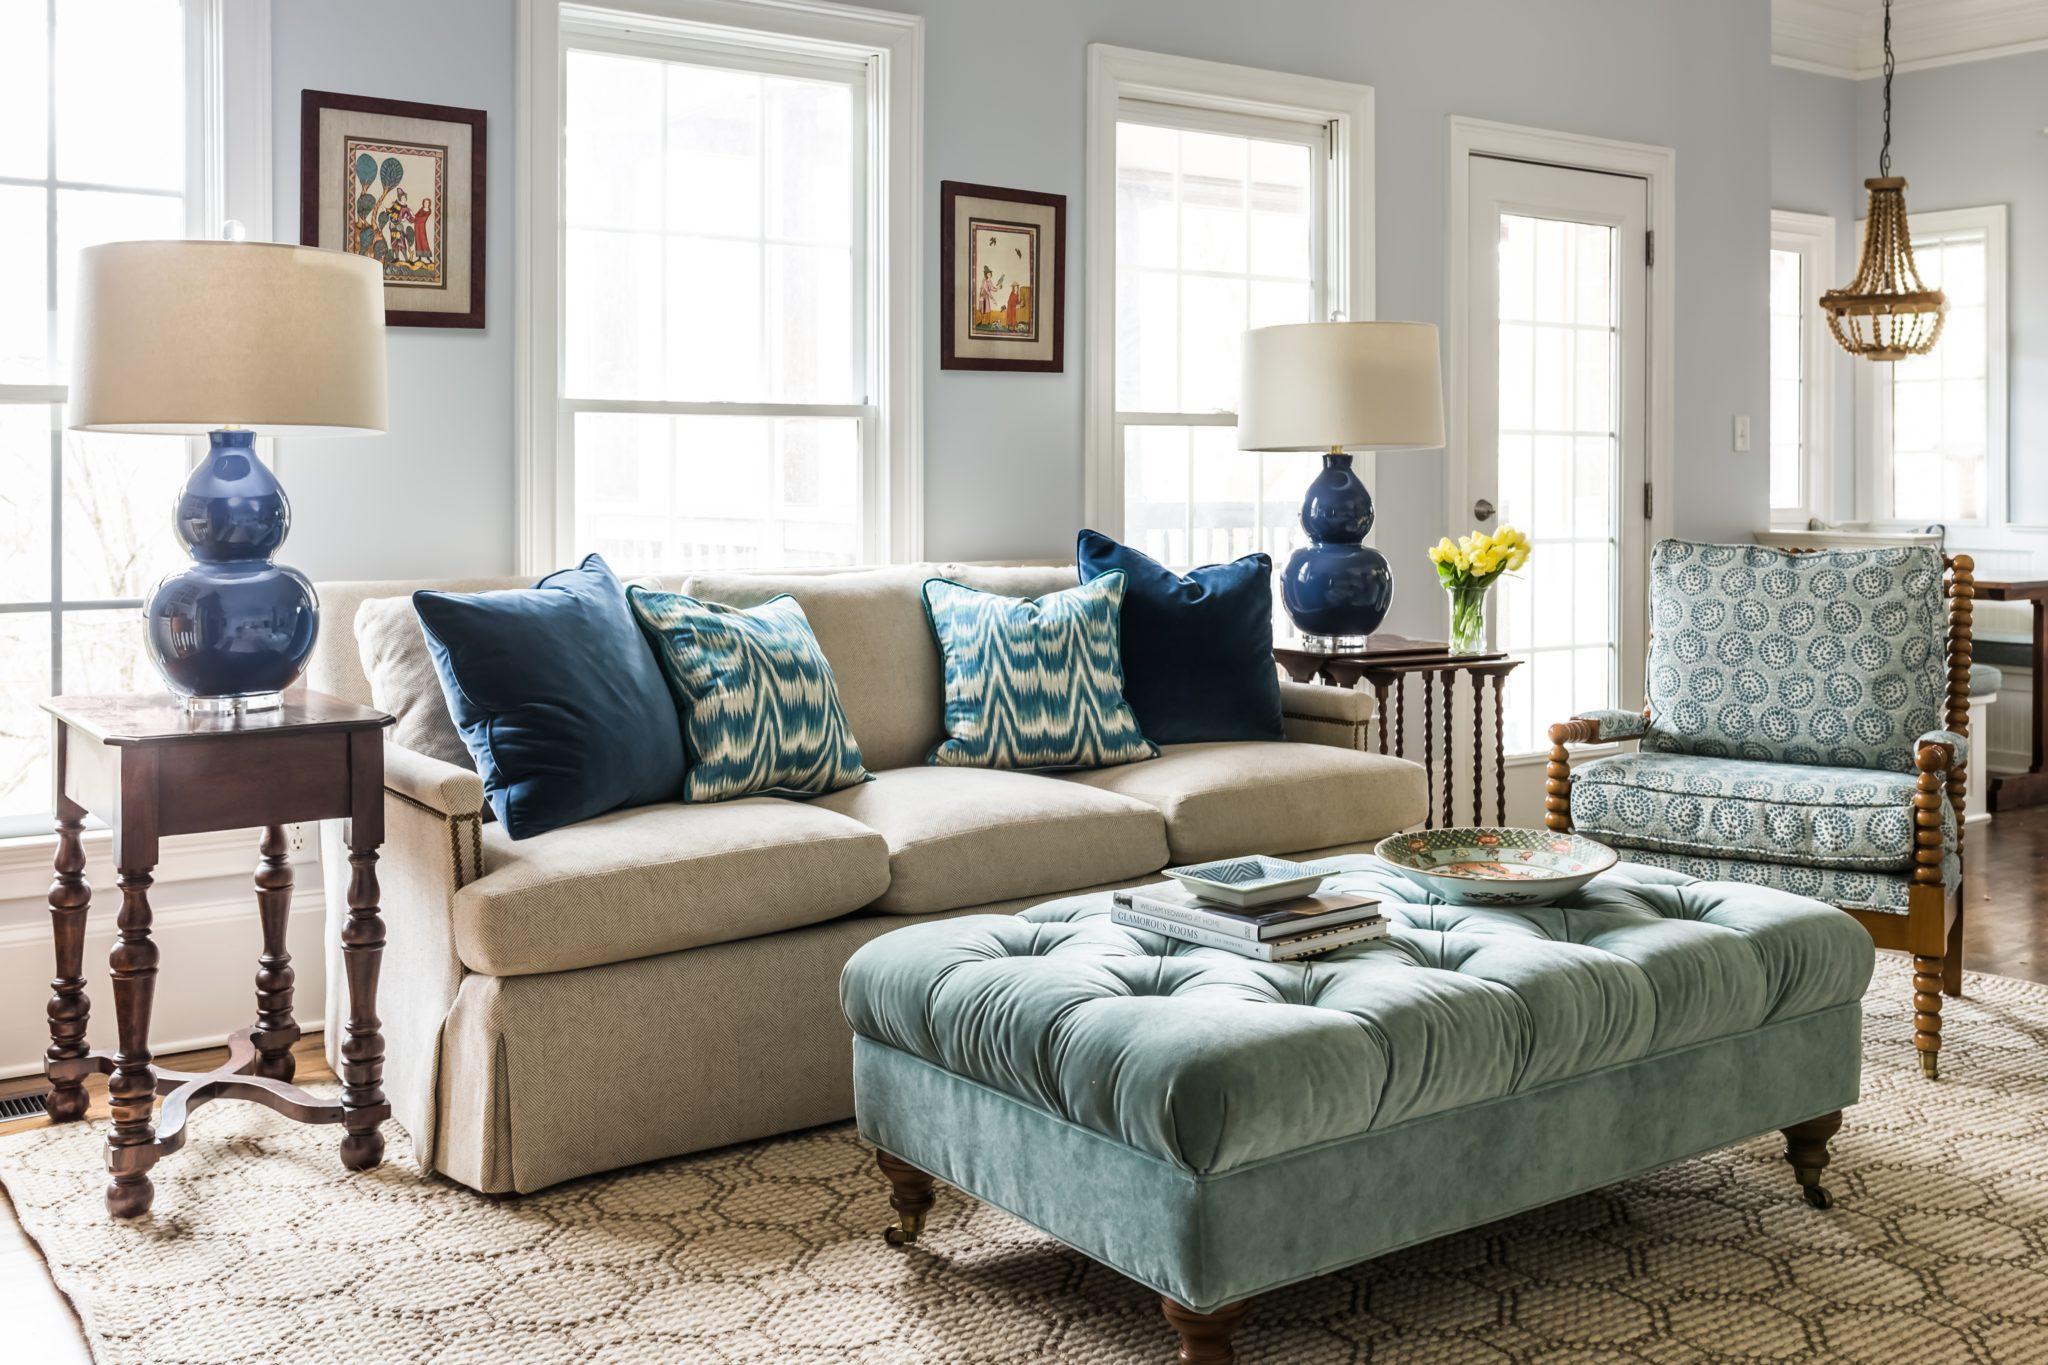 Five Points family room by Alexa Stevenson Interior Decoration